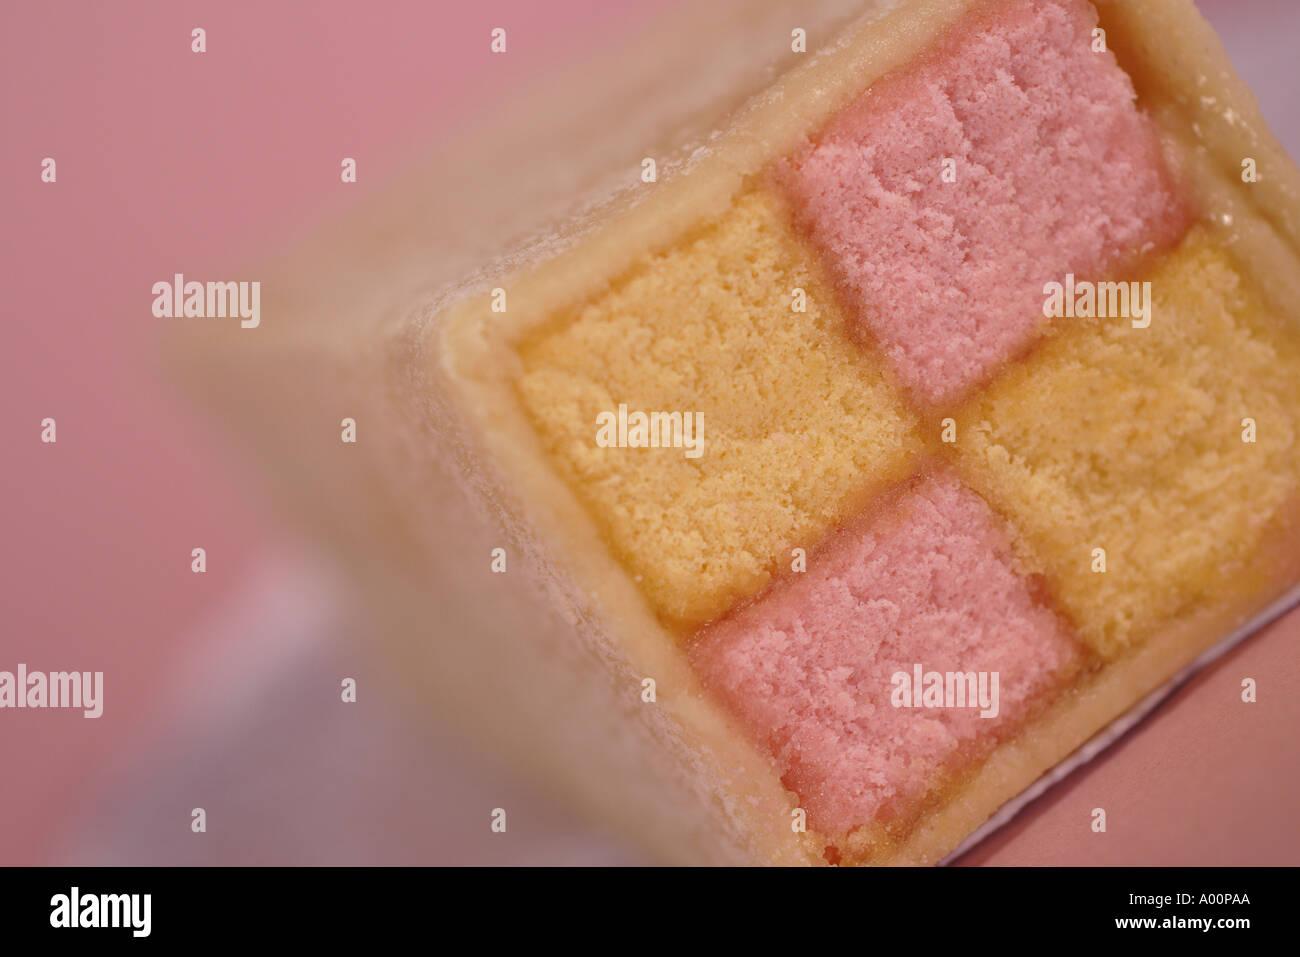 pink and yellow battenburg cake - Stock Image